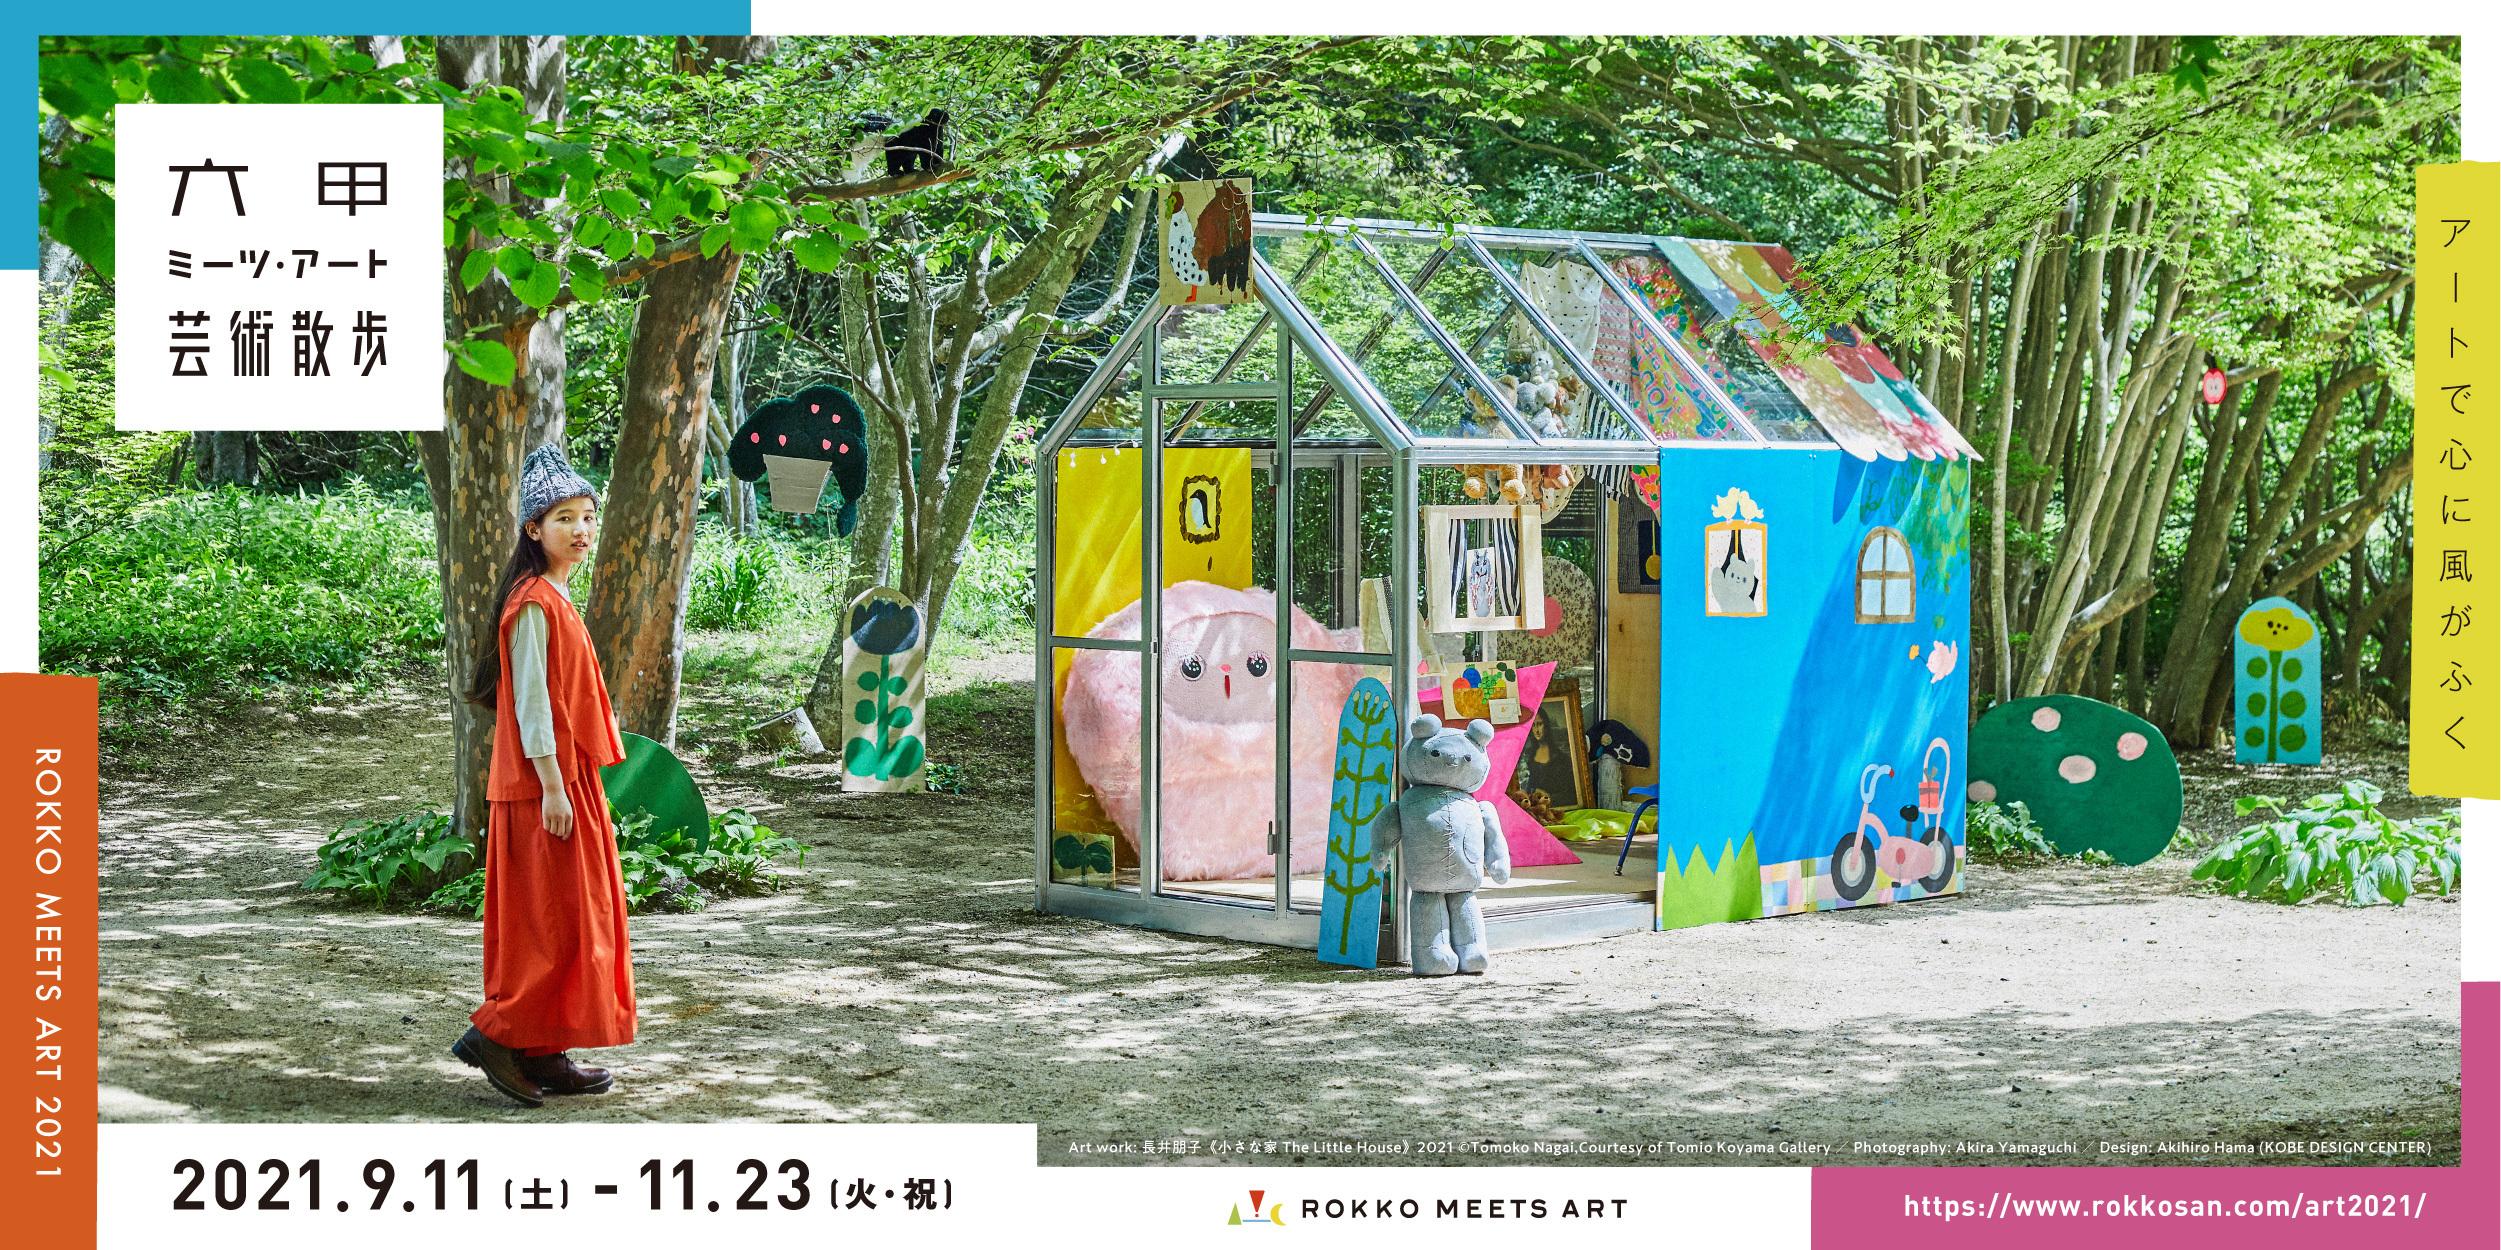 【前売券販売中!】六甲ミーツ・アート芸術散歩2021